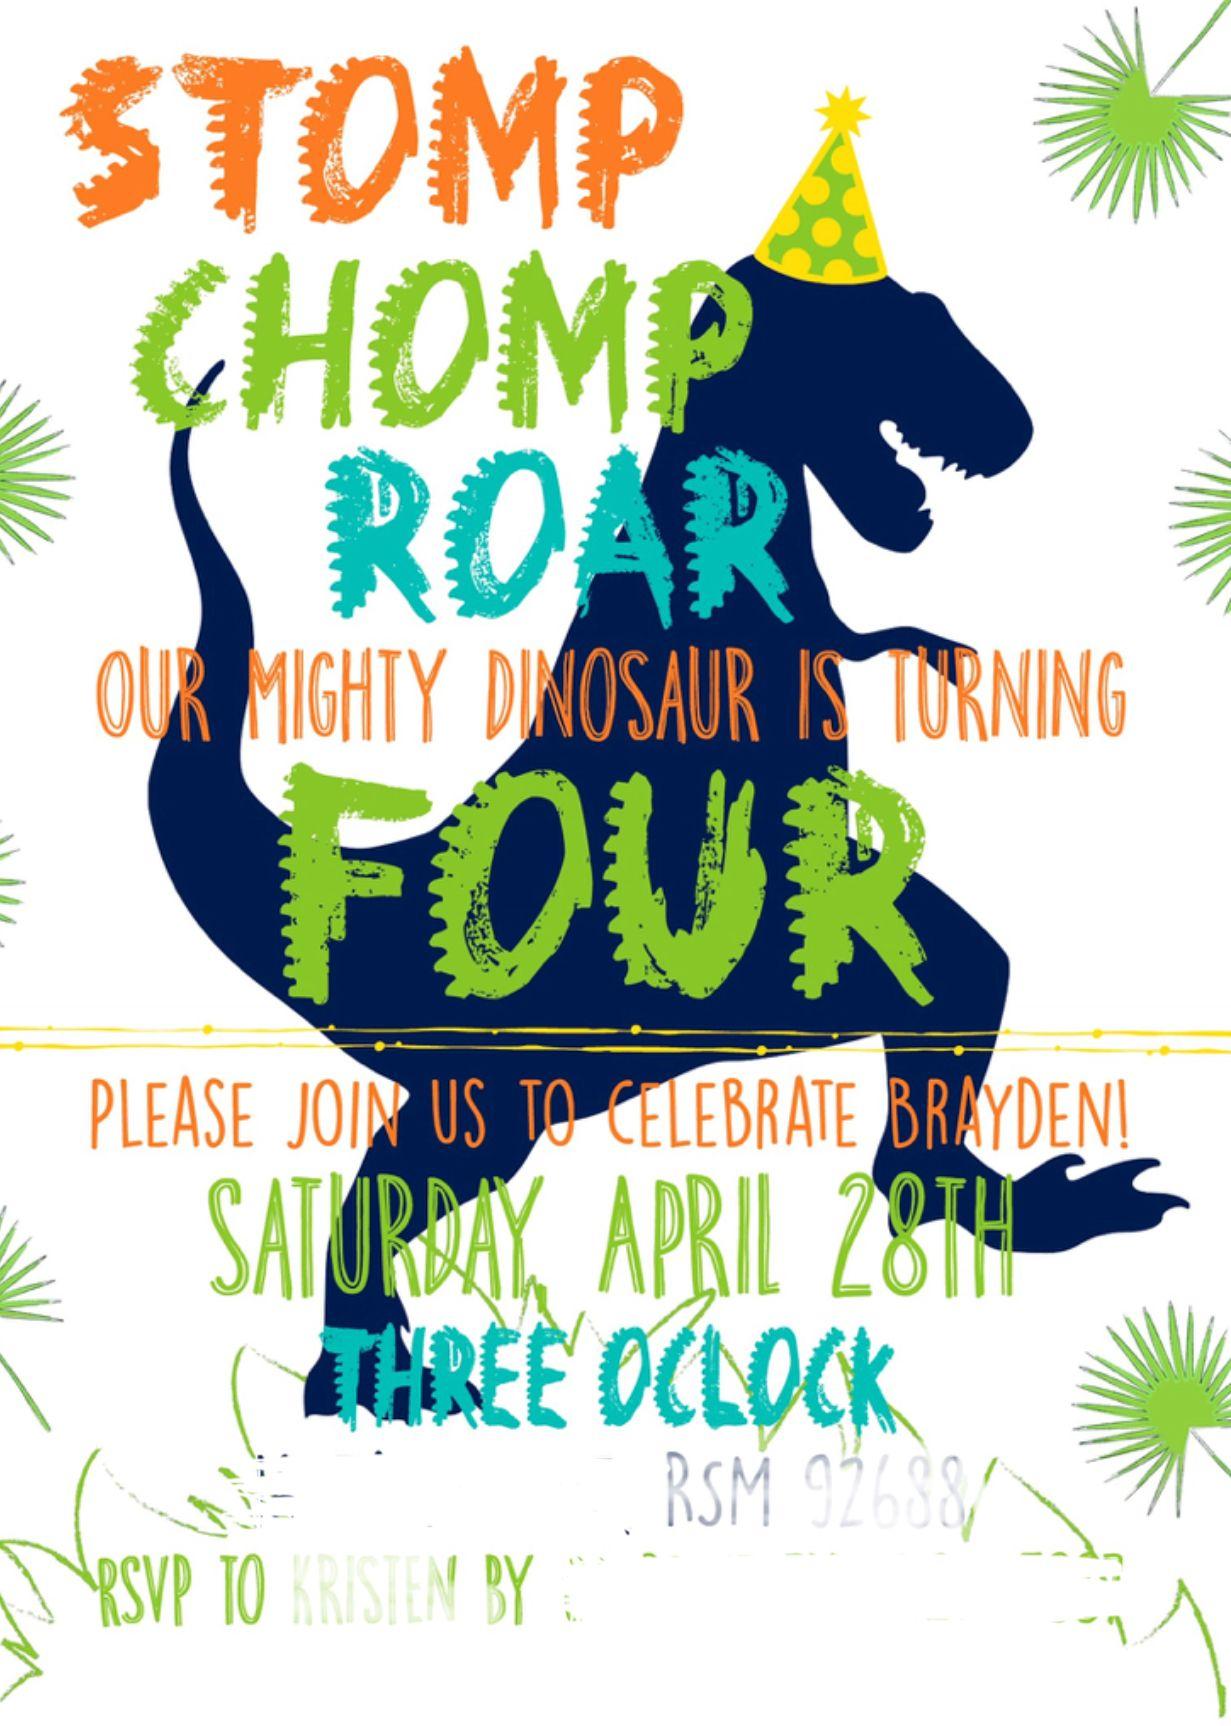 Chomp T-Rex Invitation Dinosaur Invitation Dinosaur Birthday Dinosaur Birthday Party Invitation Roar Invitation Stomp Digital